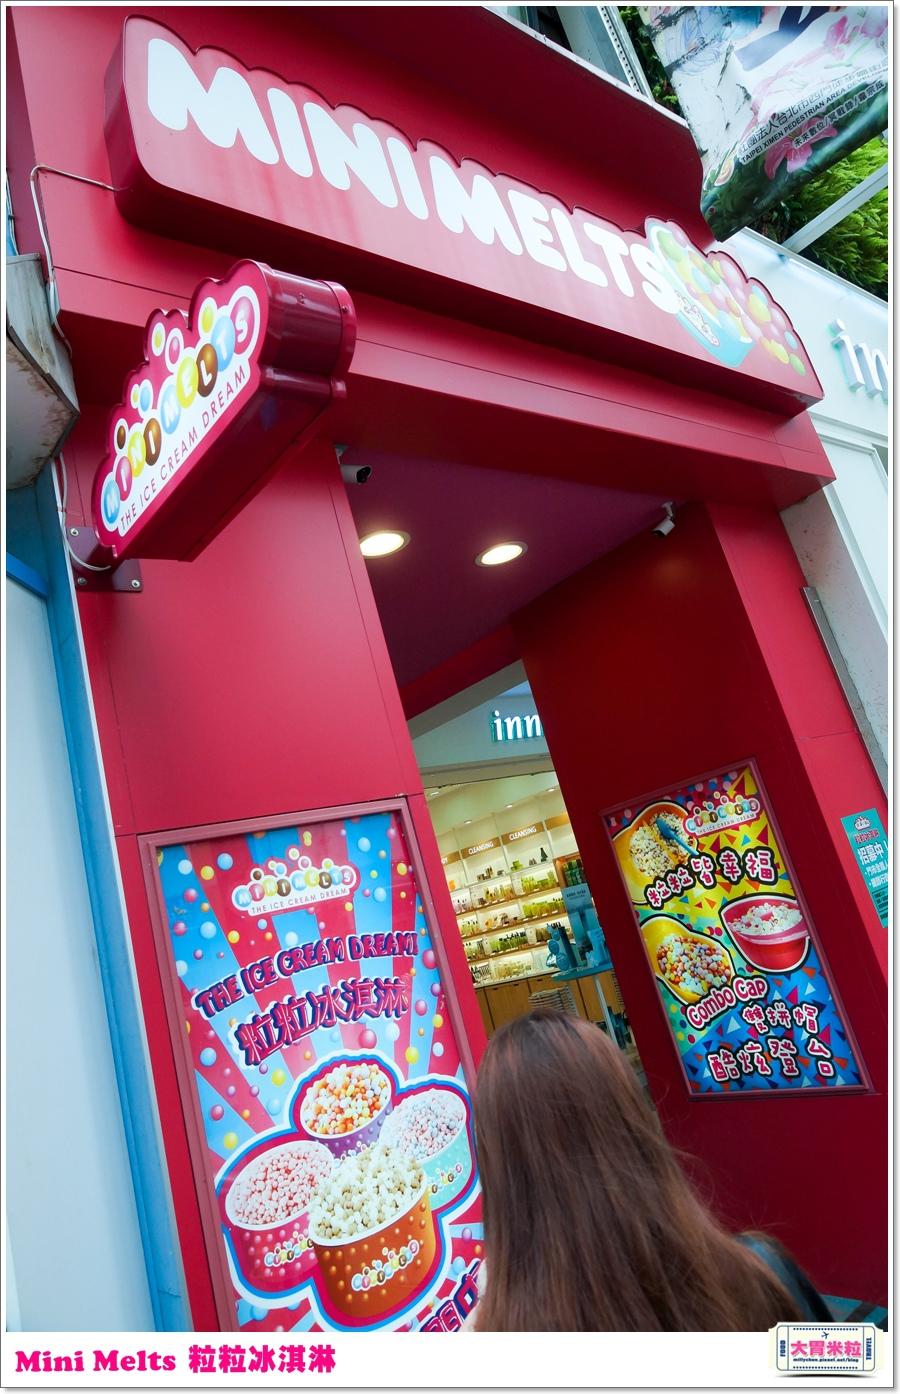 Mini Melts粒粒冰淇淋0005.jpg